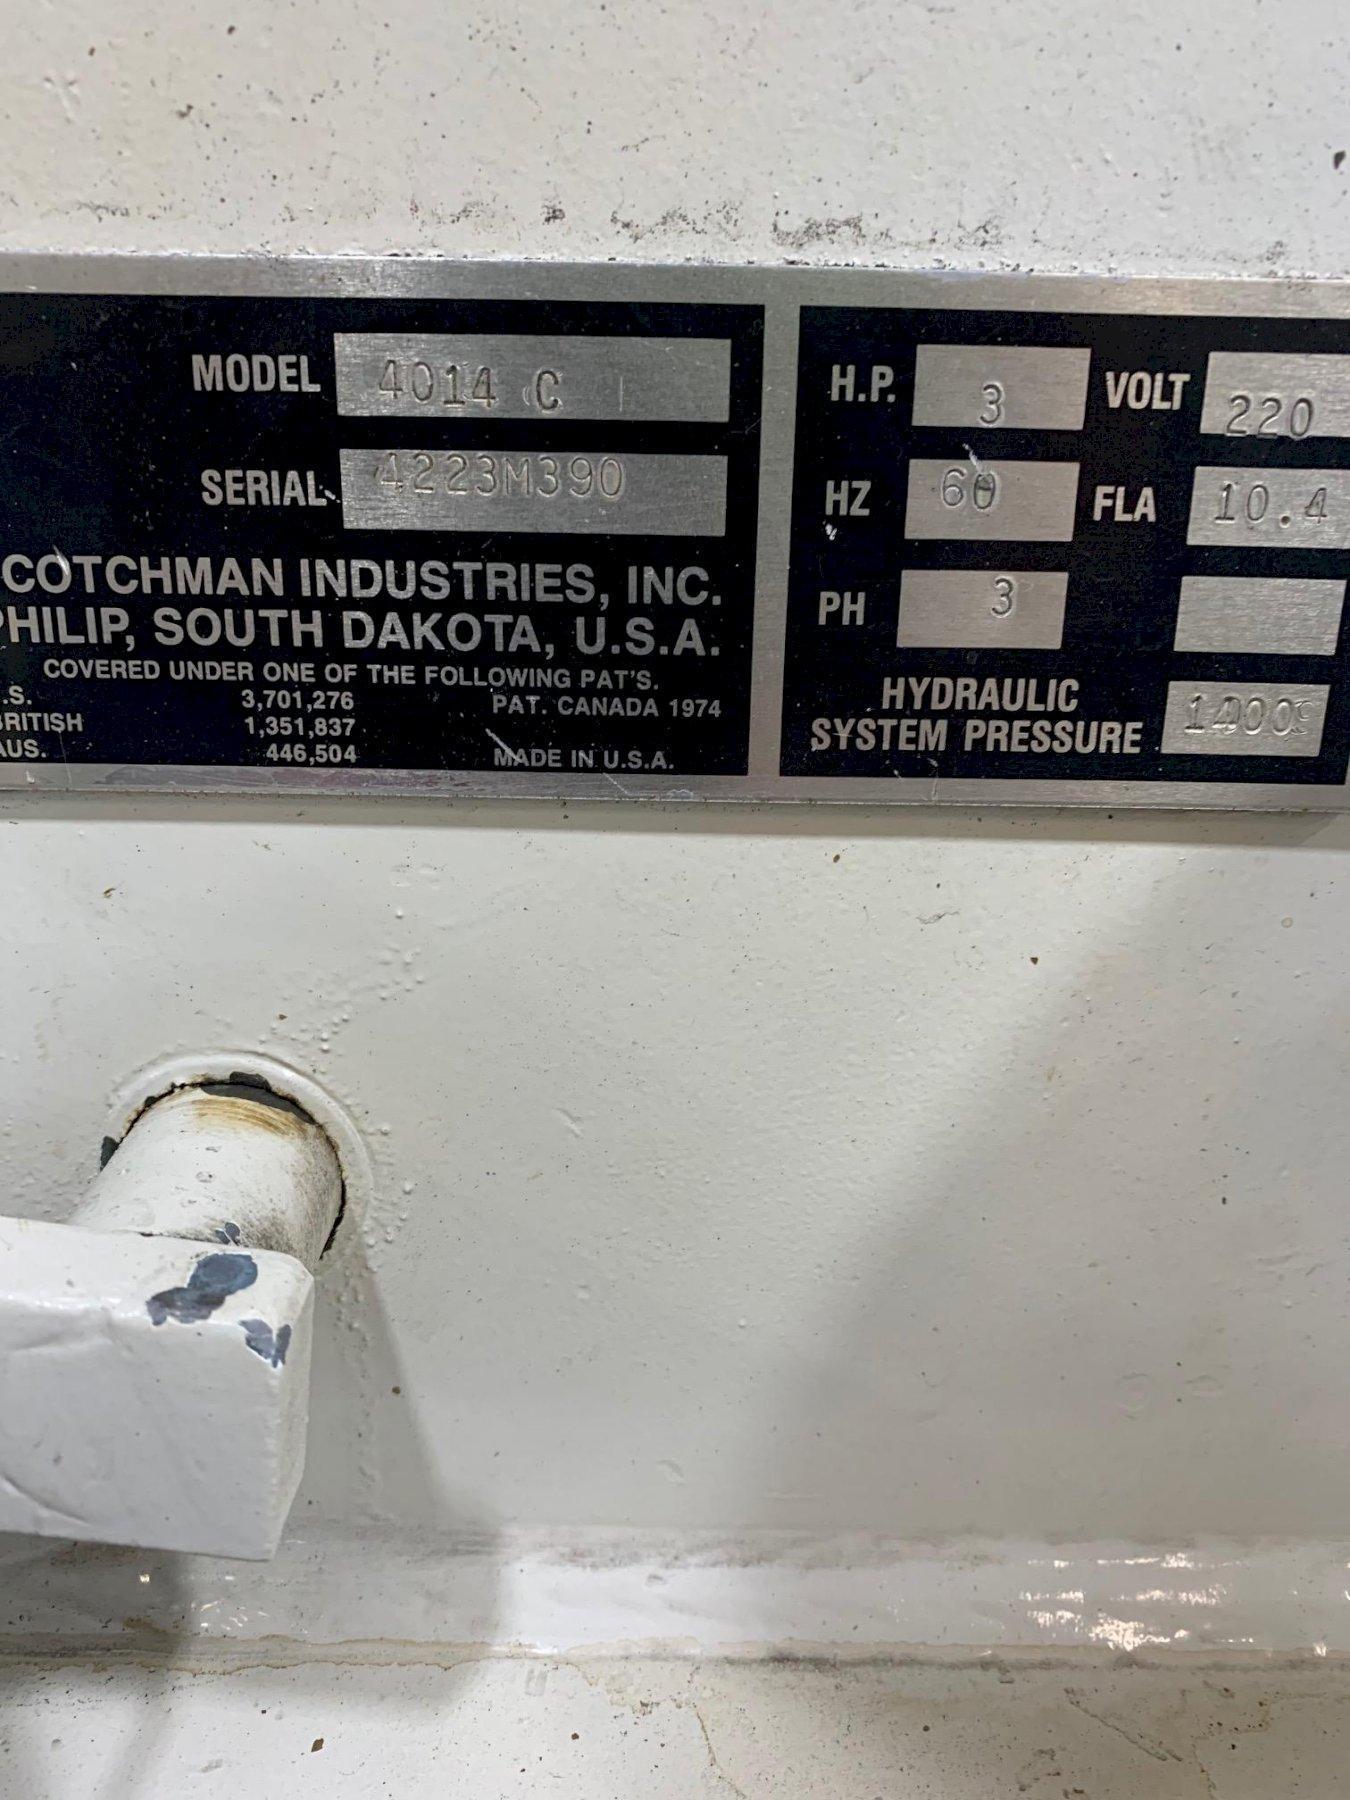 USED SCOTCHMAN 40 TON HYDRAULIC IRONWORKER MODEL 4014C, Stock # 10744, Year 1990